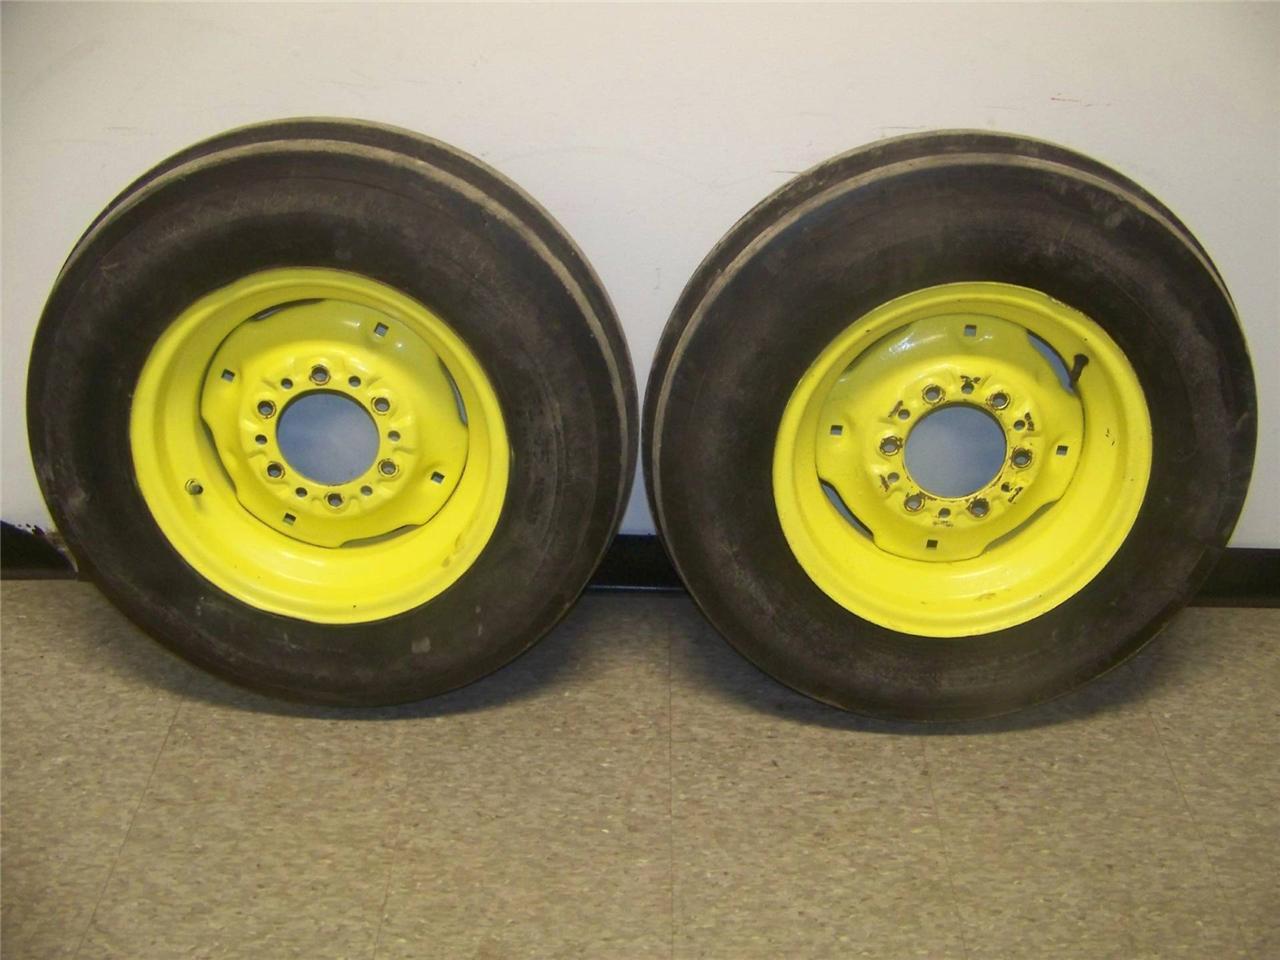 John Deere Tractor Tire Rims : New john deere front tractor tire hole wheel rim